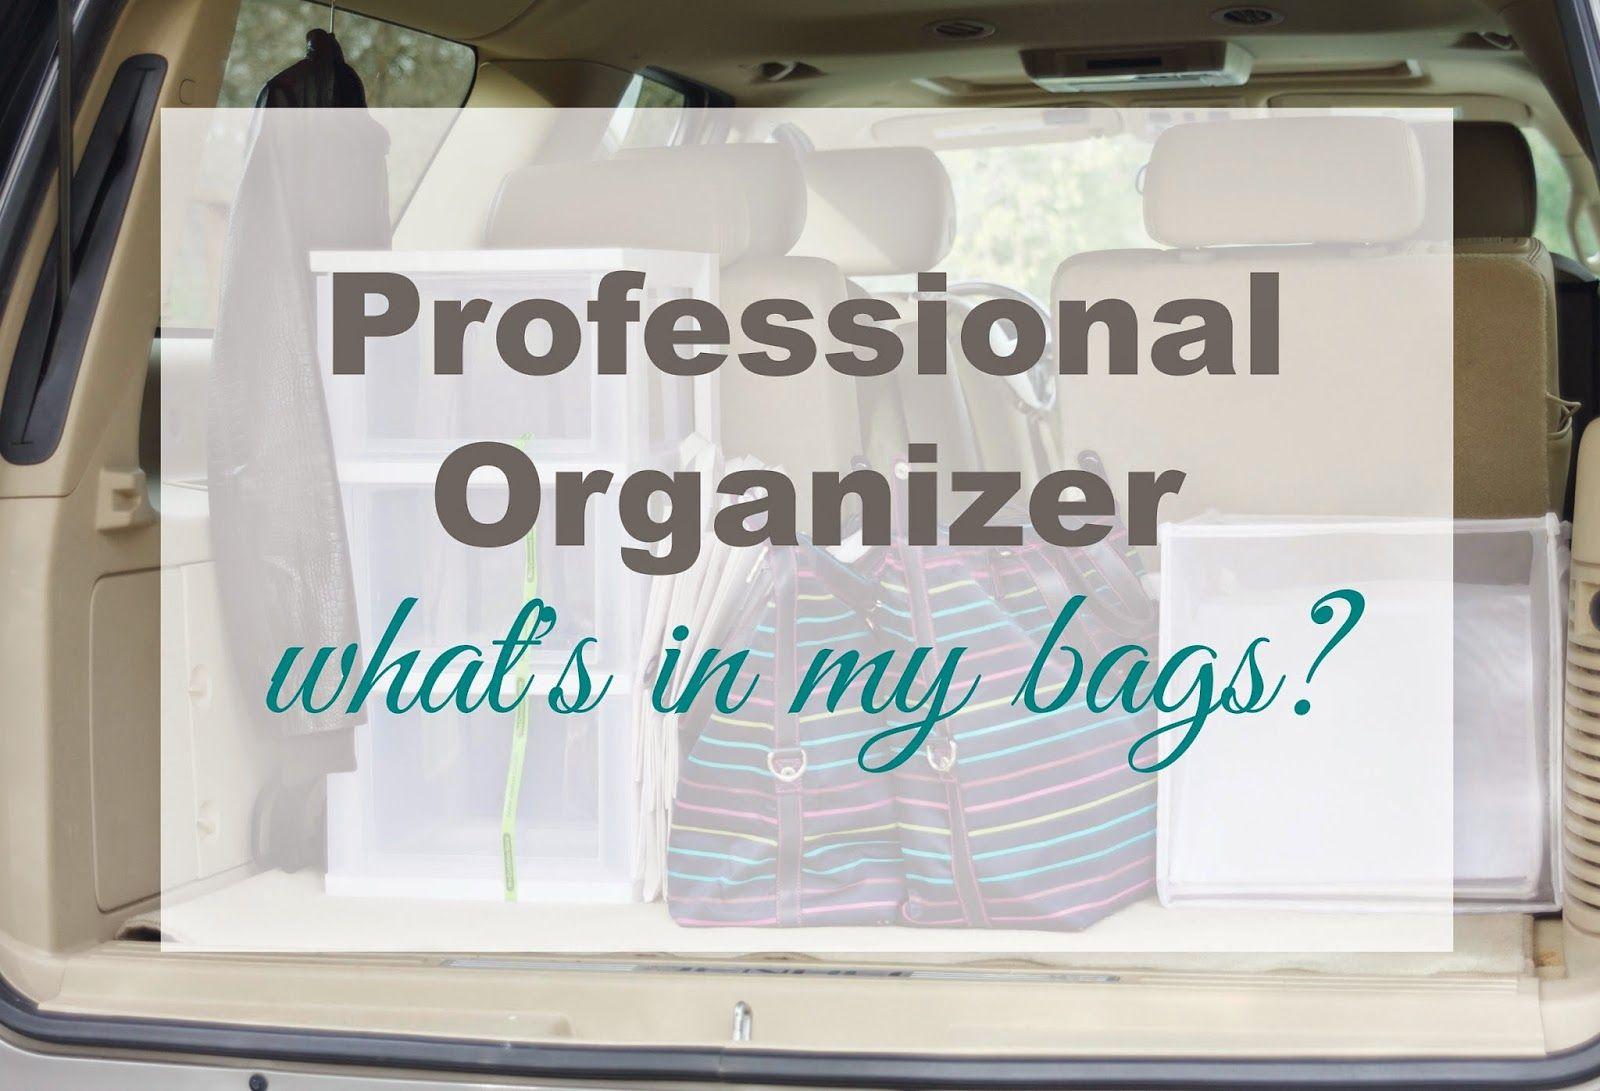 Organizer Professional